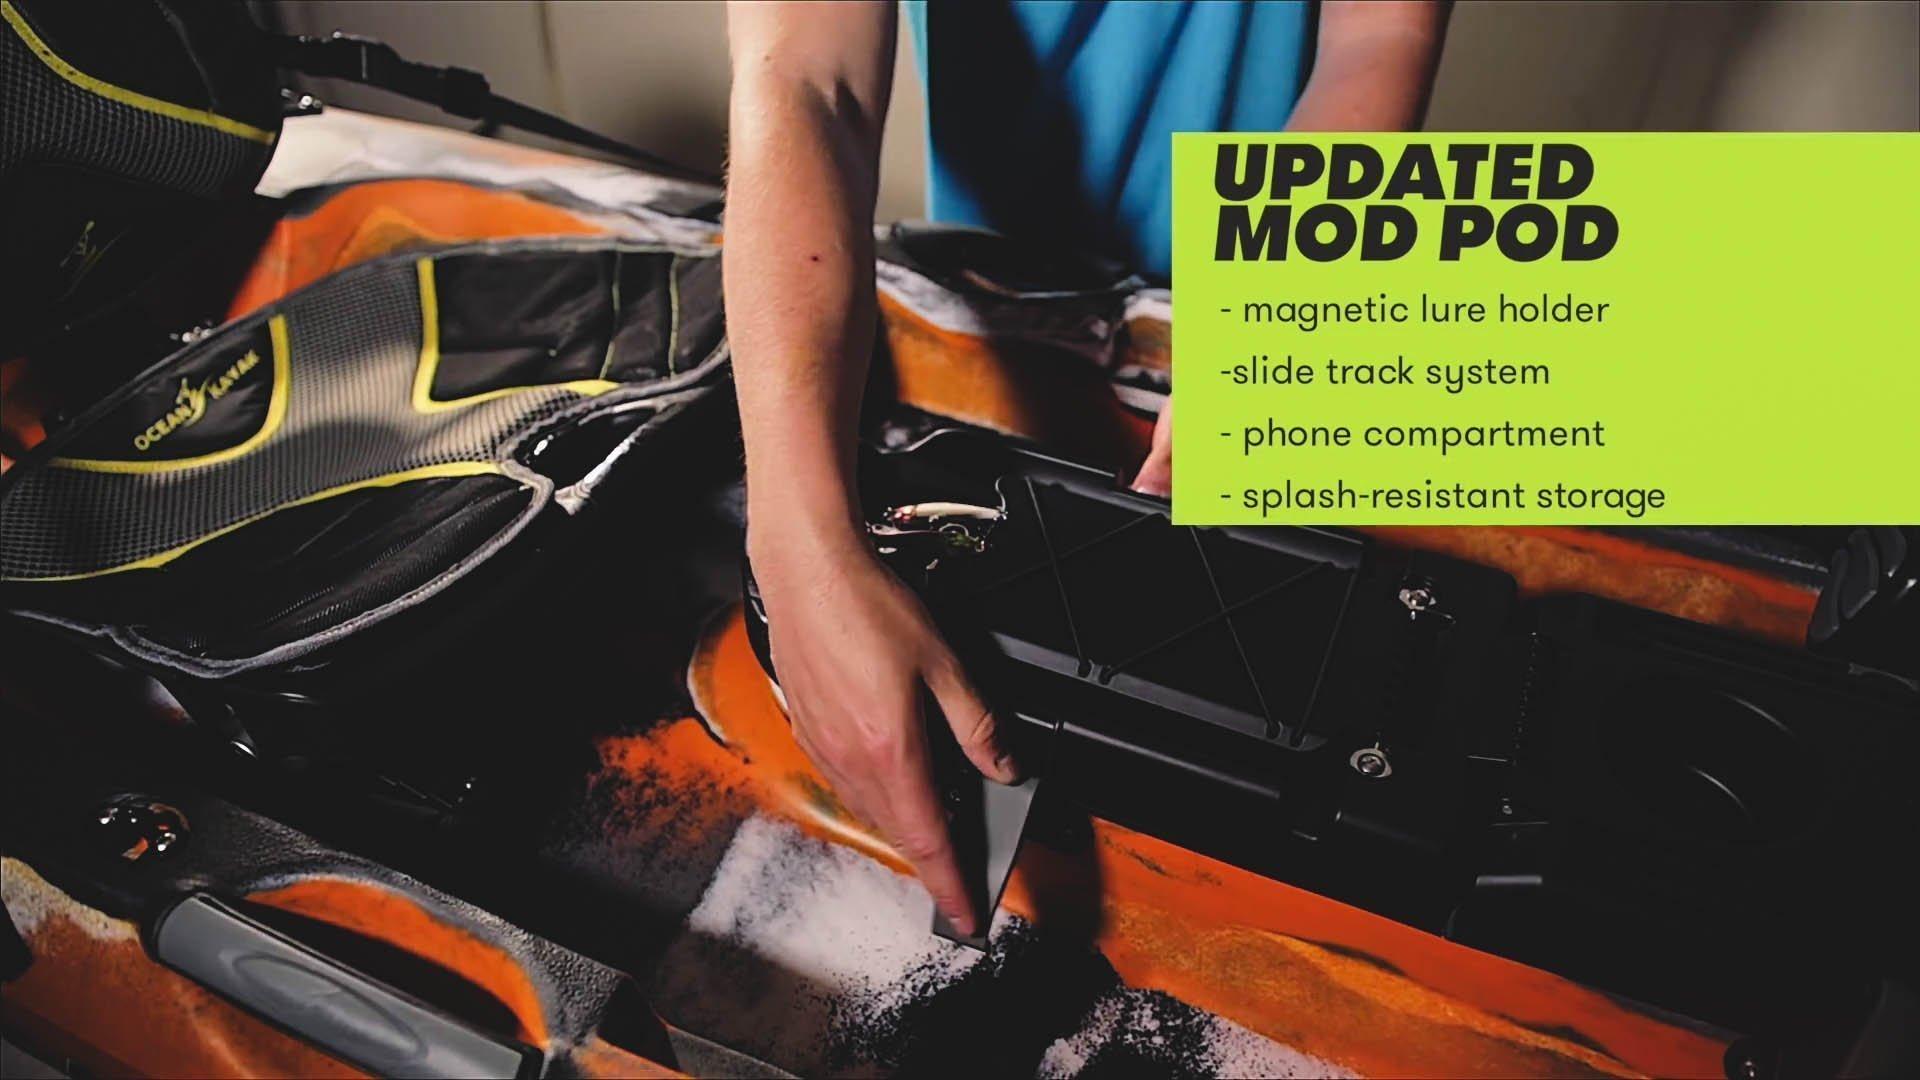 updated mod pod of ocean kayak trident 13 angler